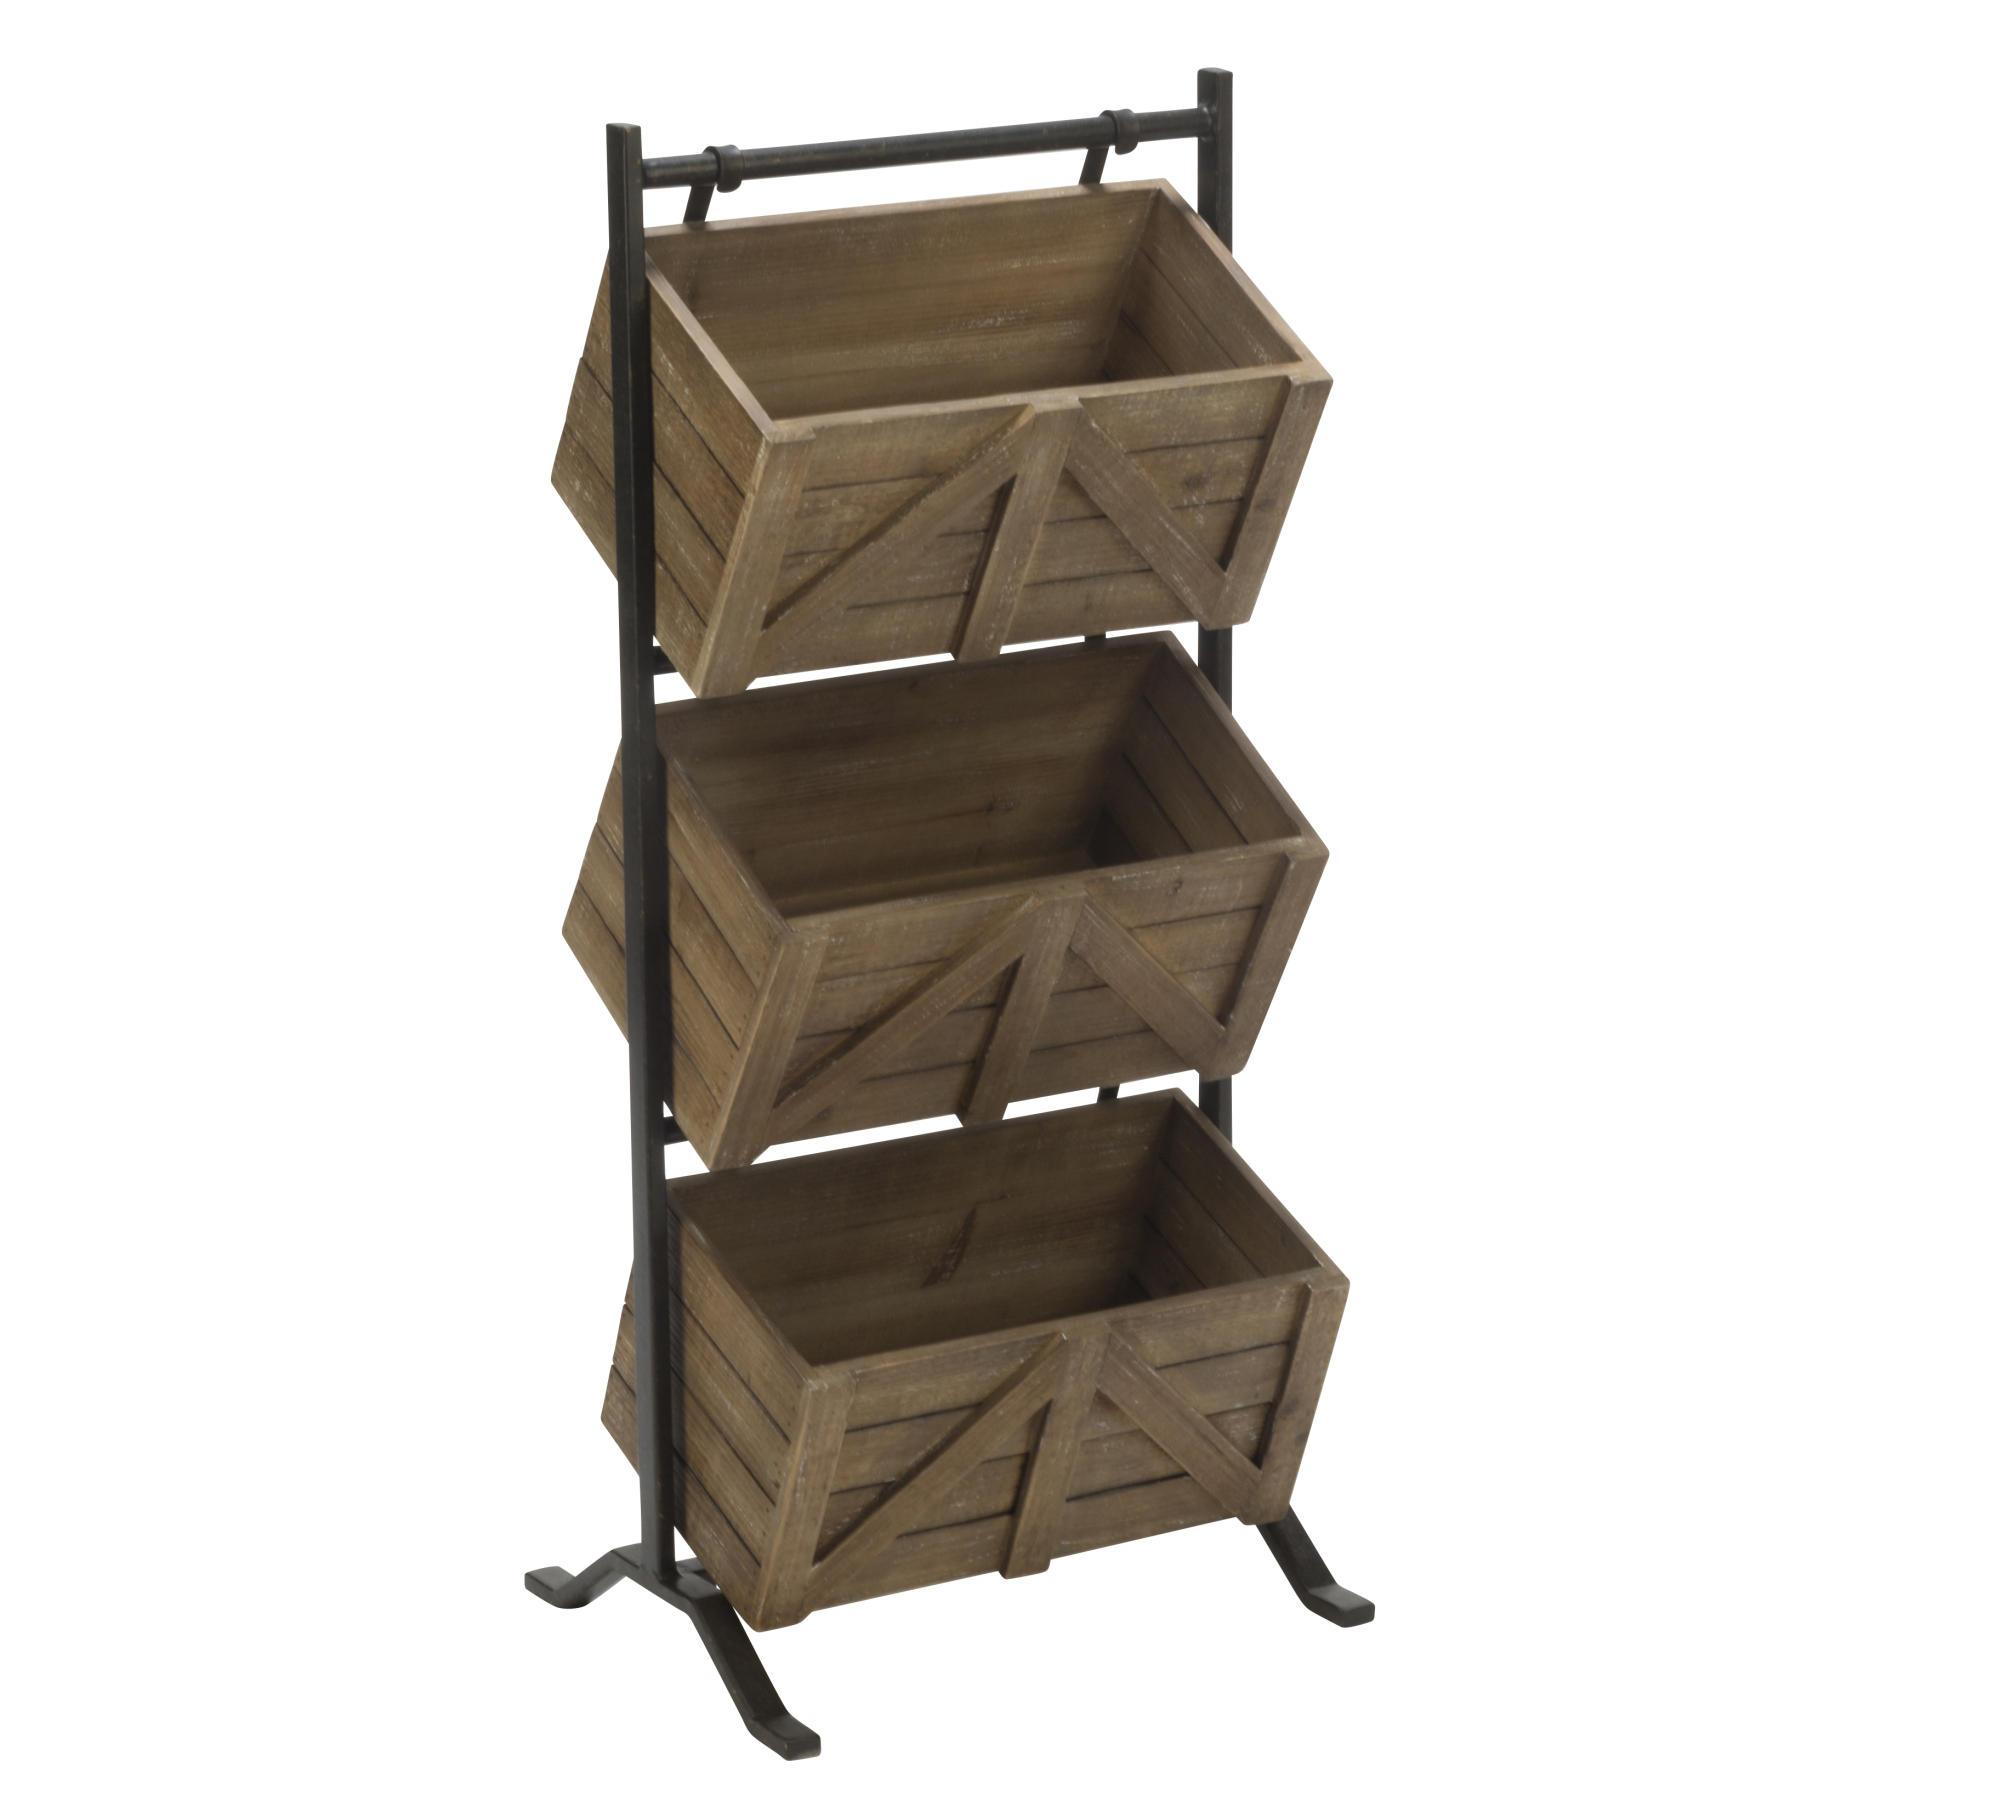 Preferred 3 Tier Wooden Crate Stand - Tripar International, Inc. KO79